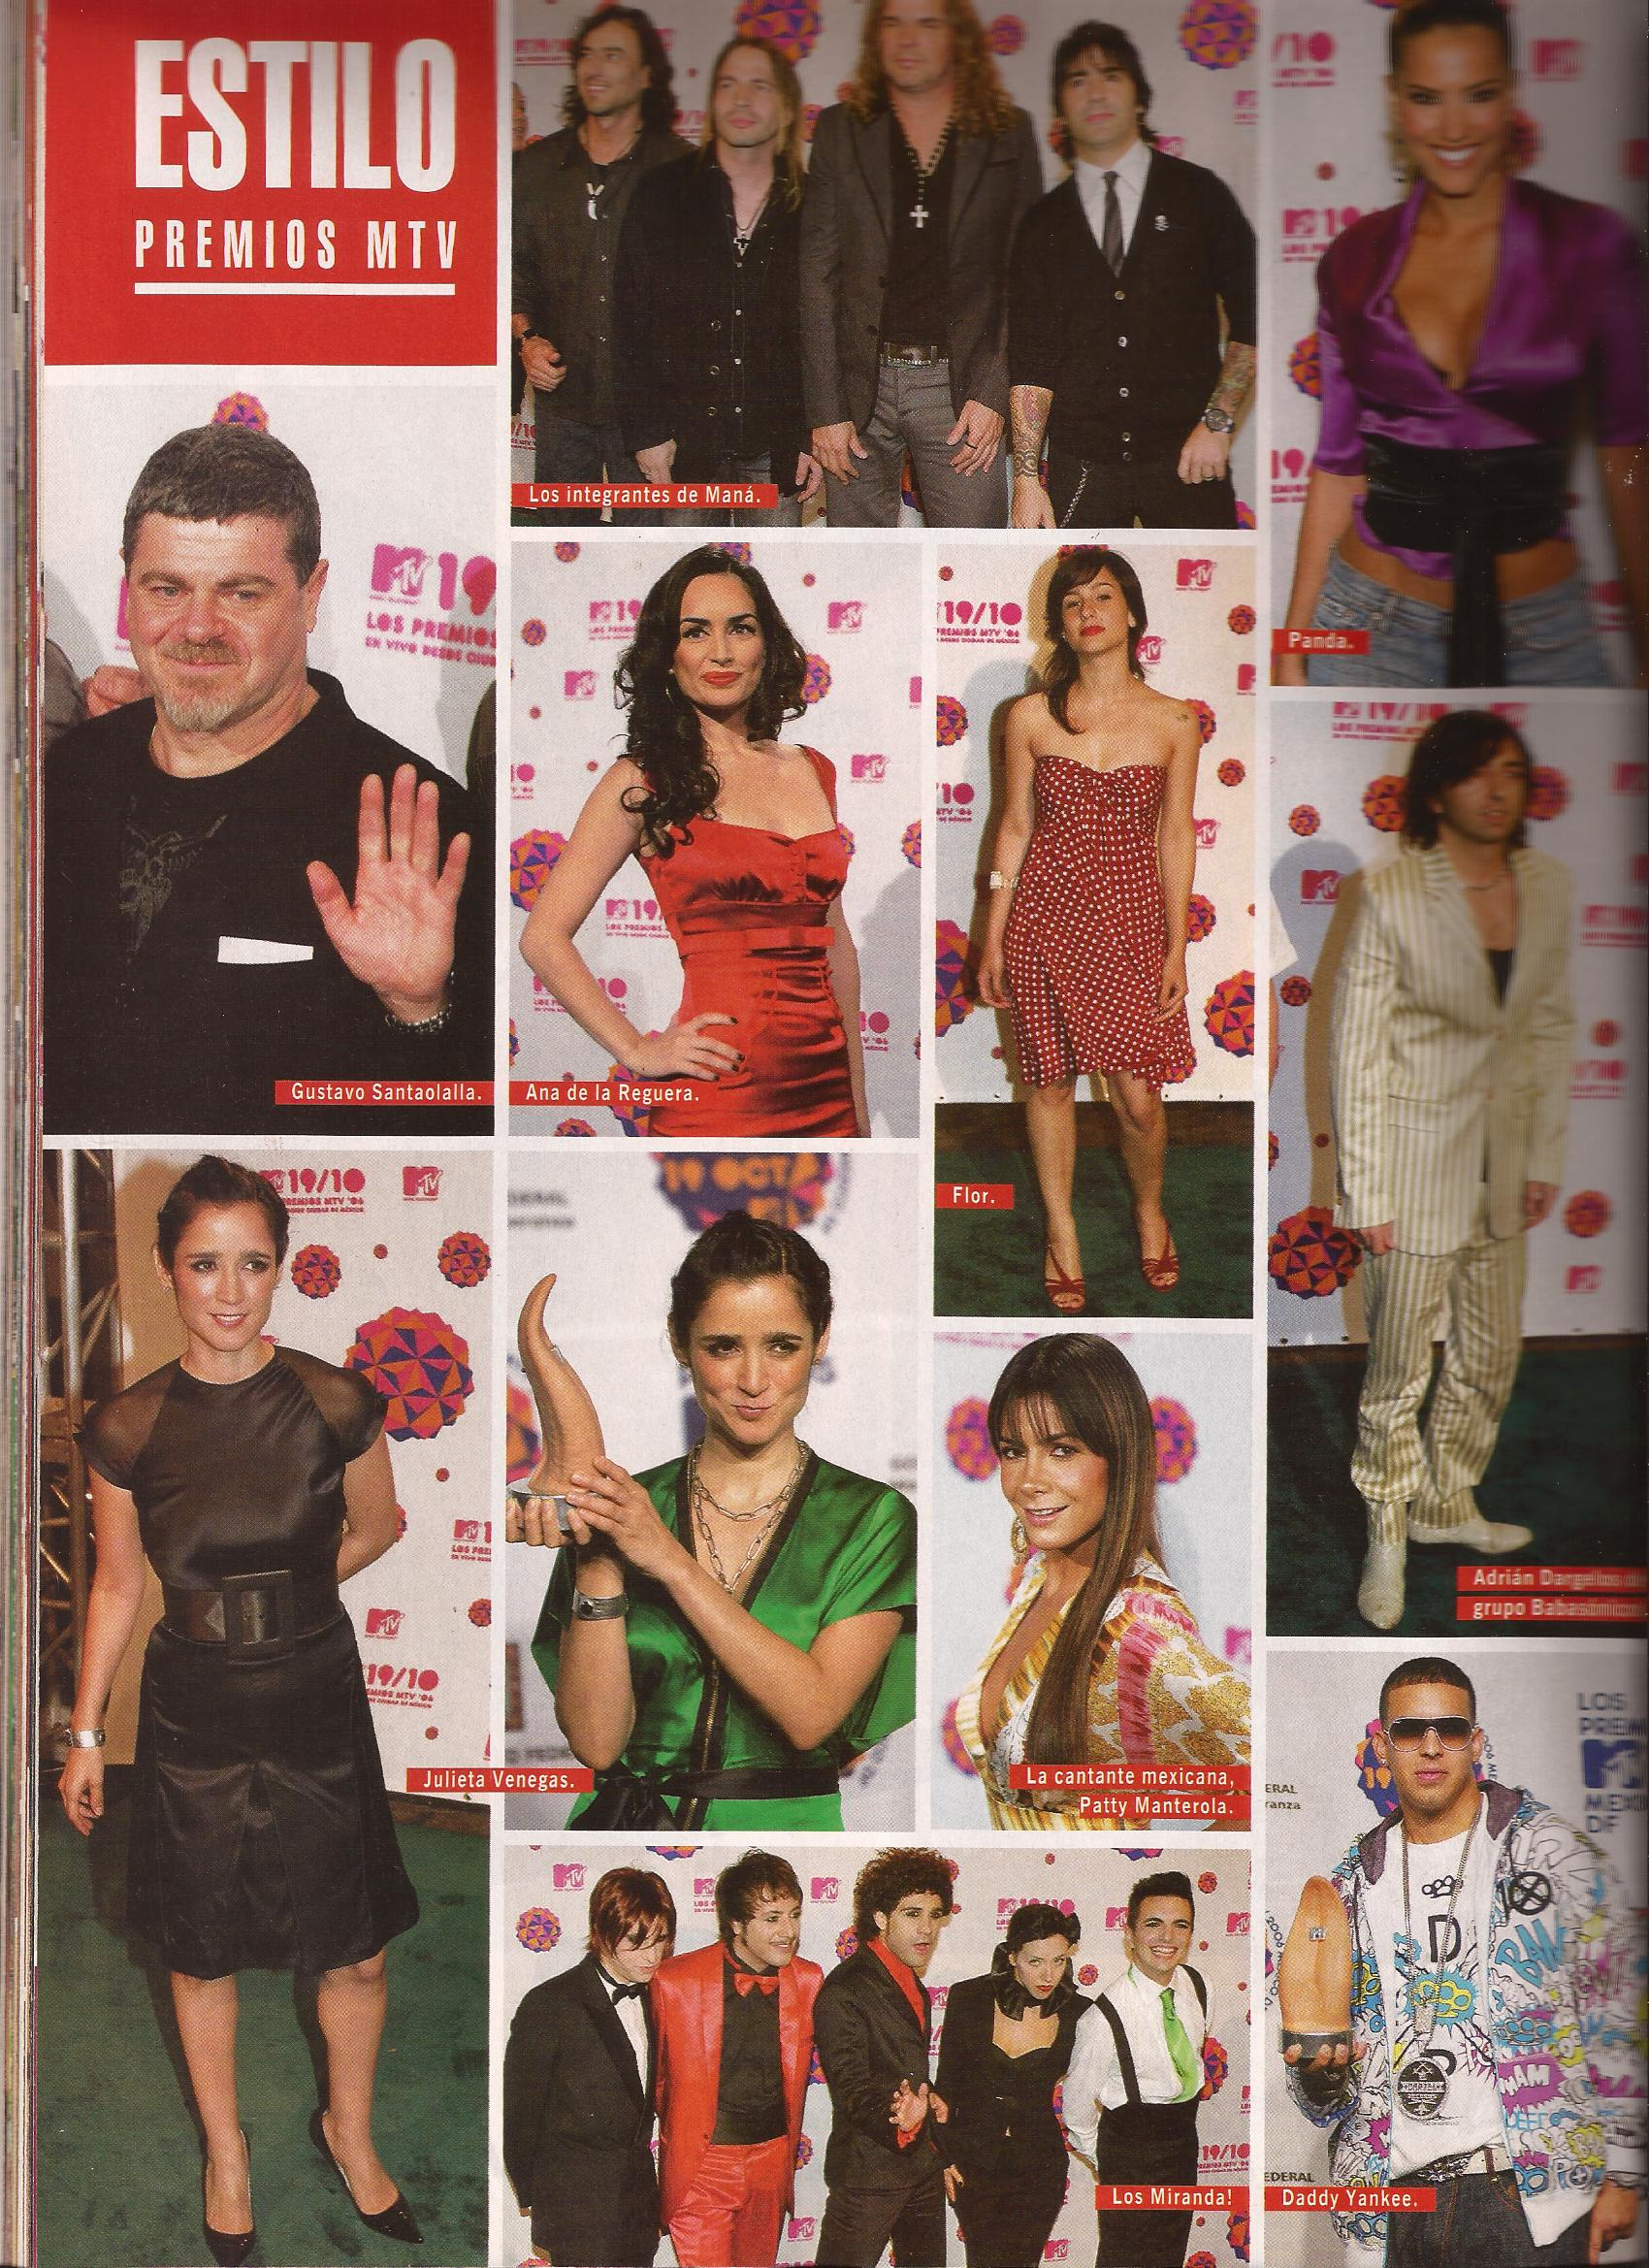 Premios Mtv Latinos. Revista Caras